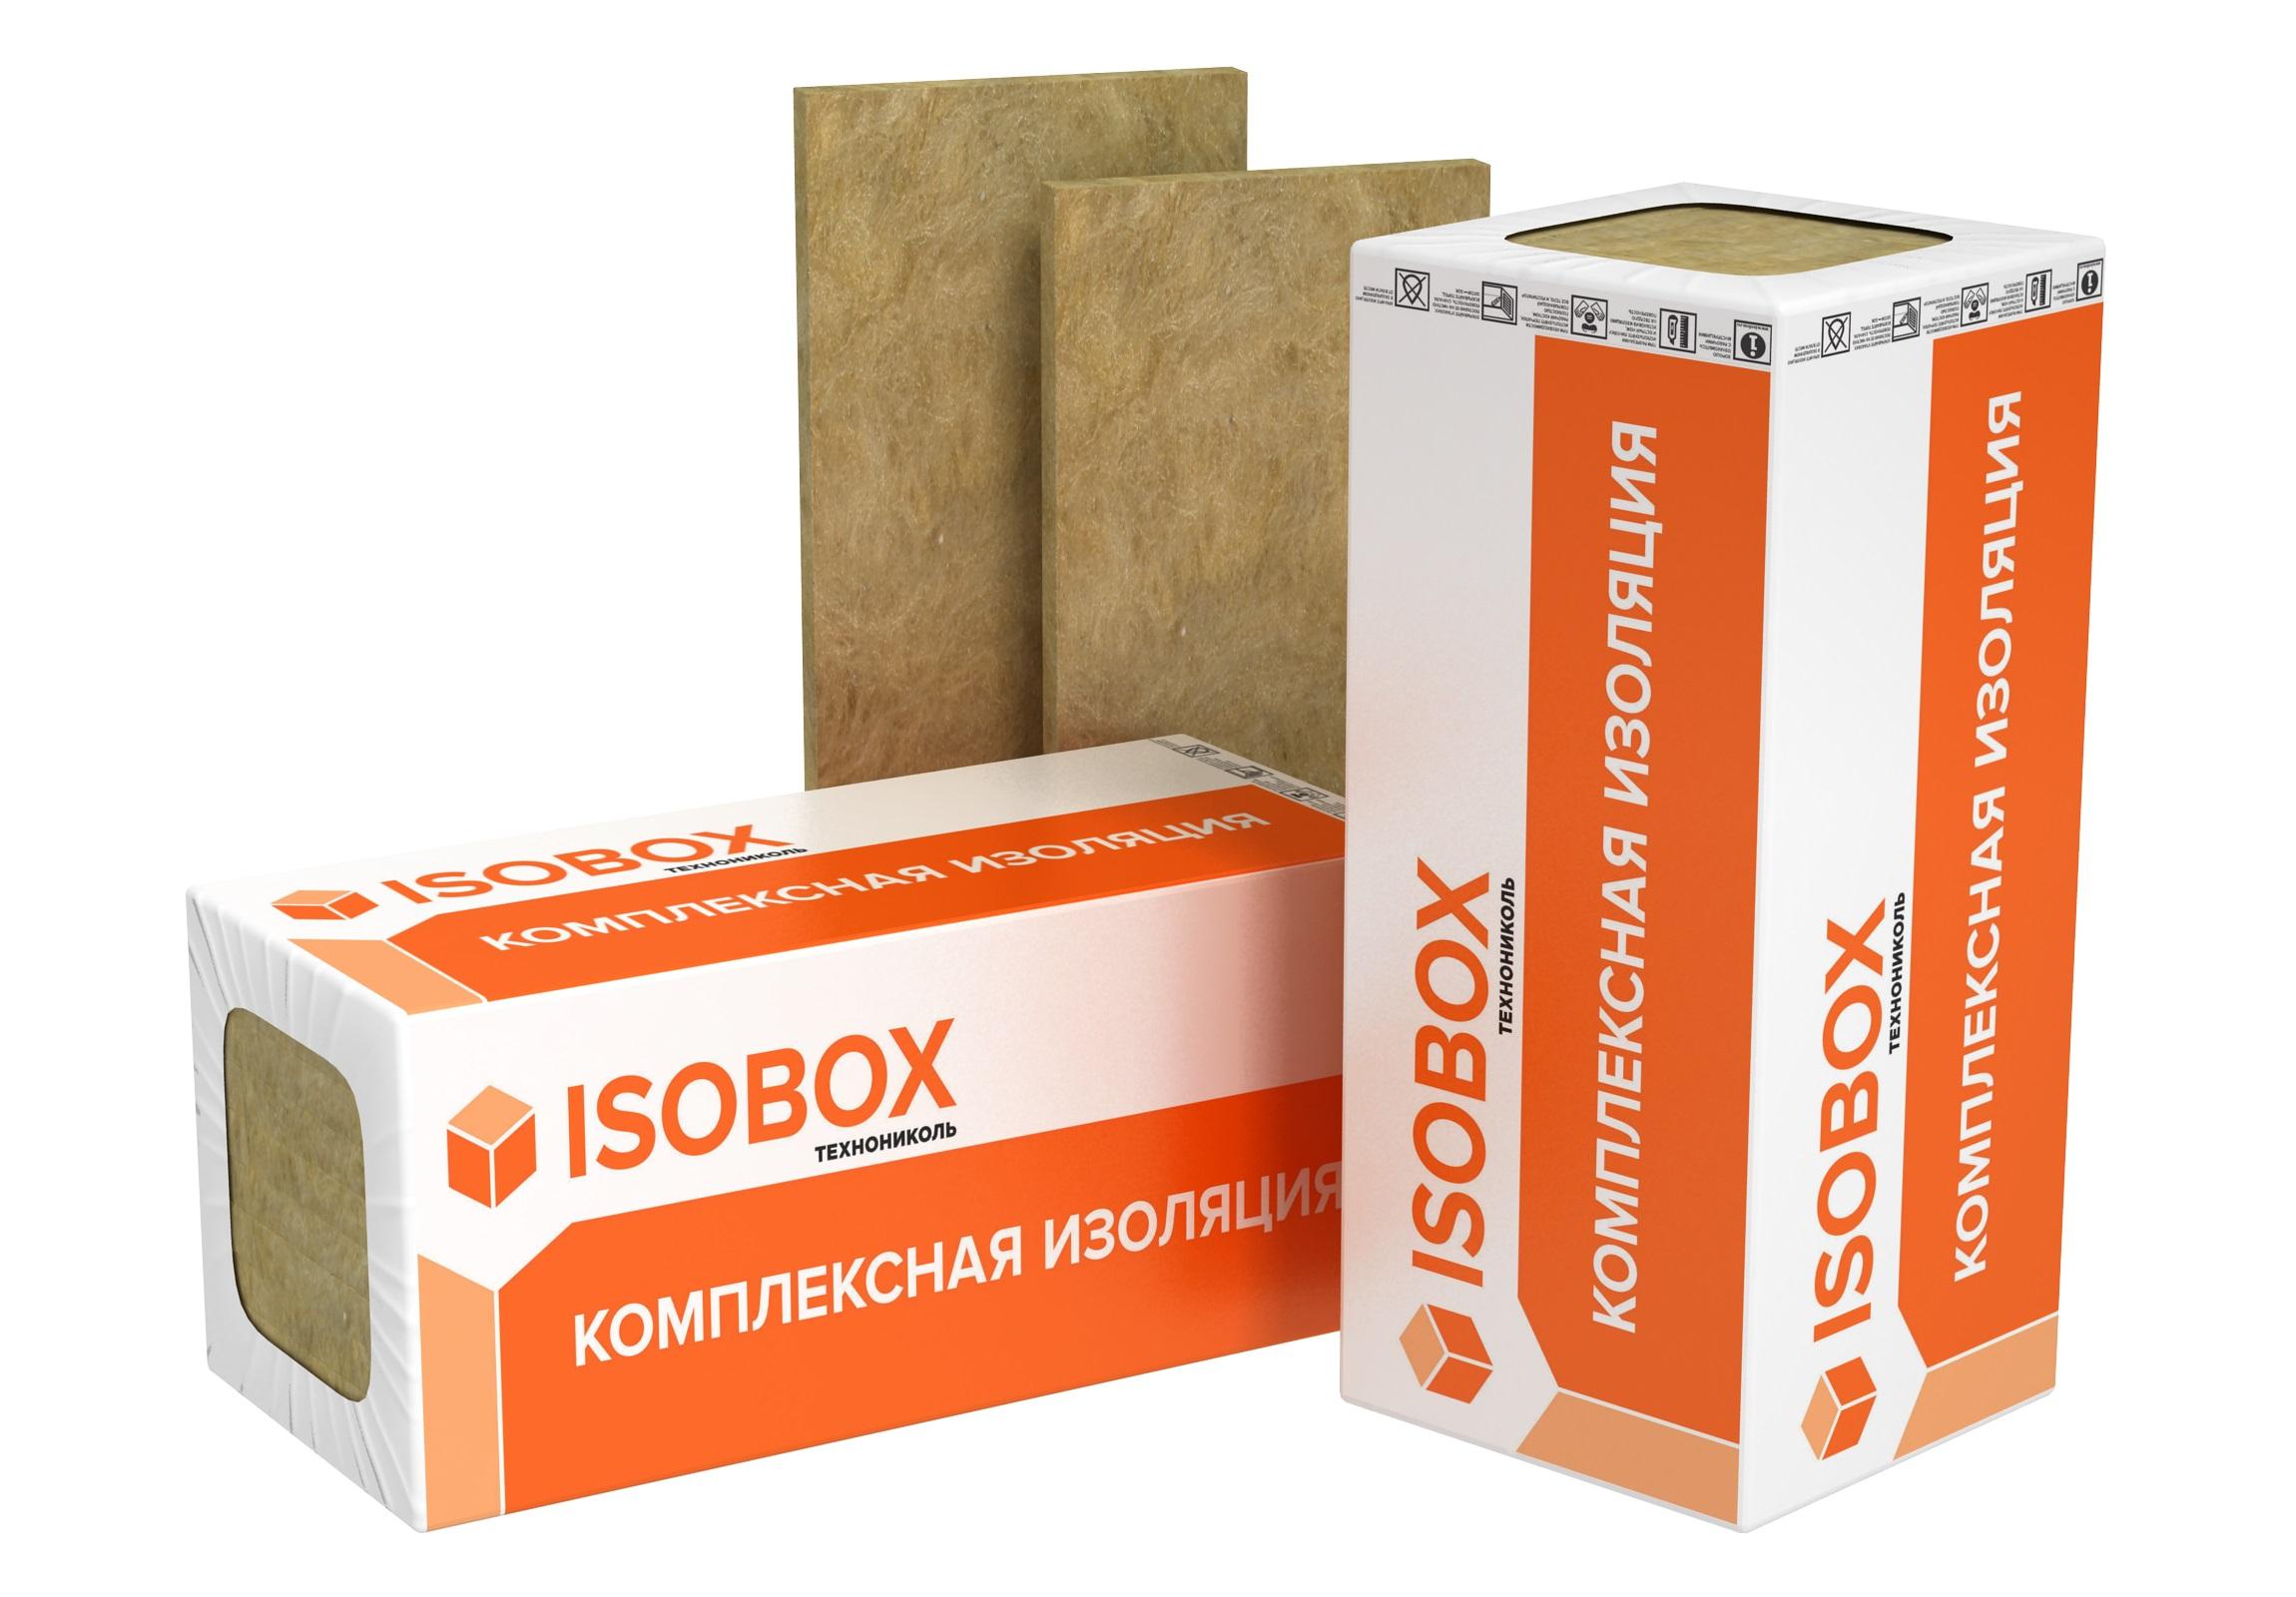 Базальтовая вата Isobox Инсайд 1200х600х50 мм